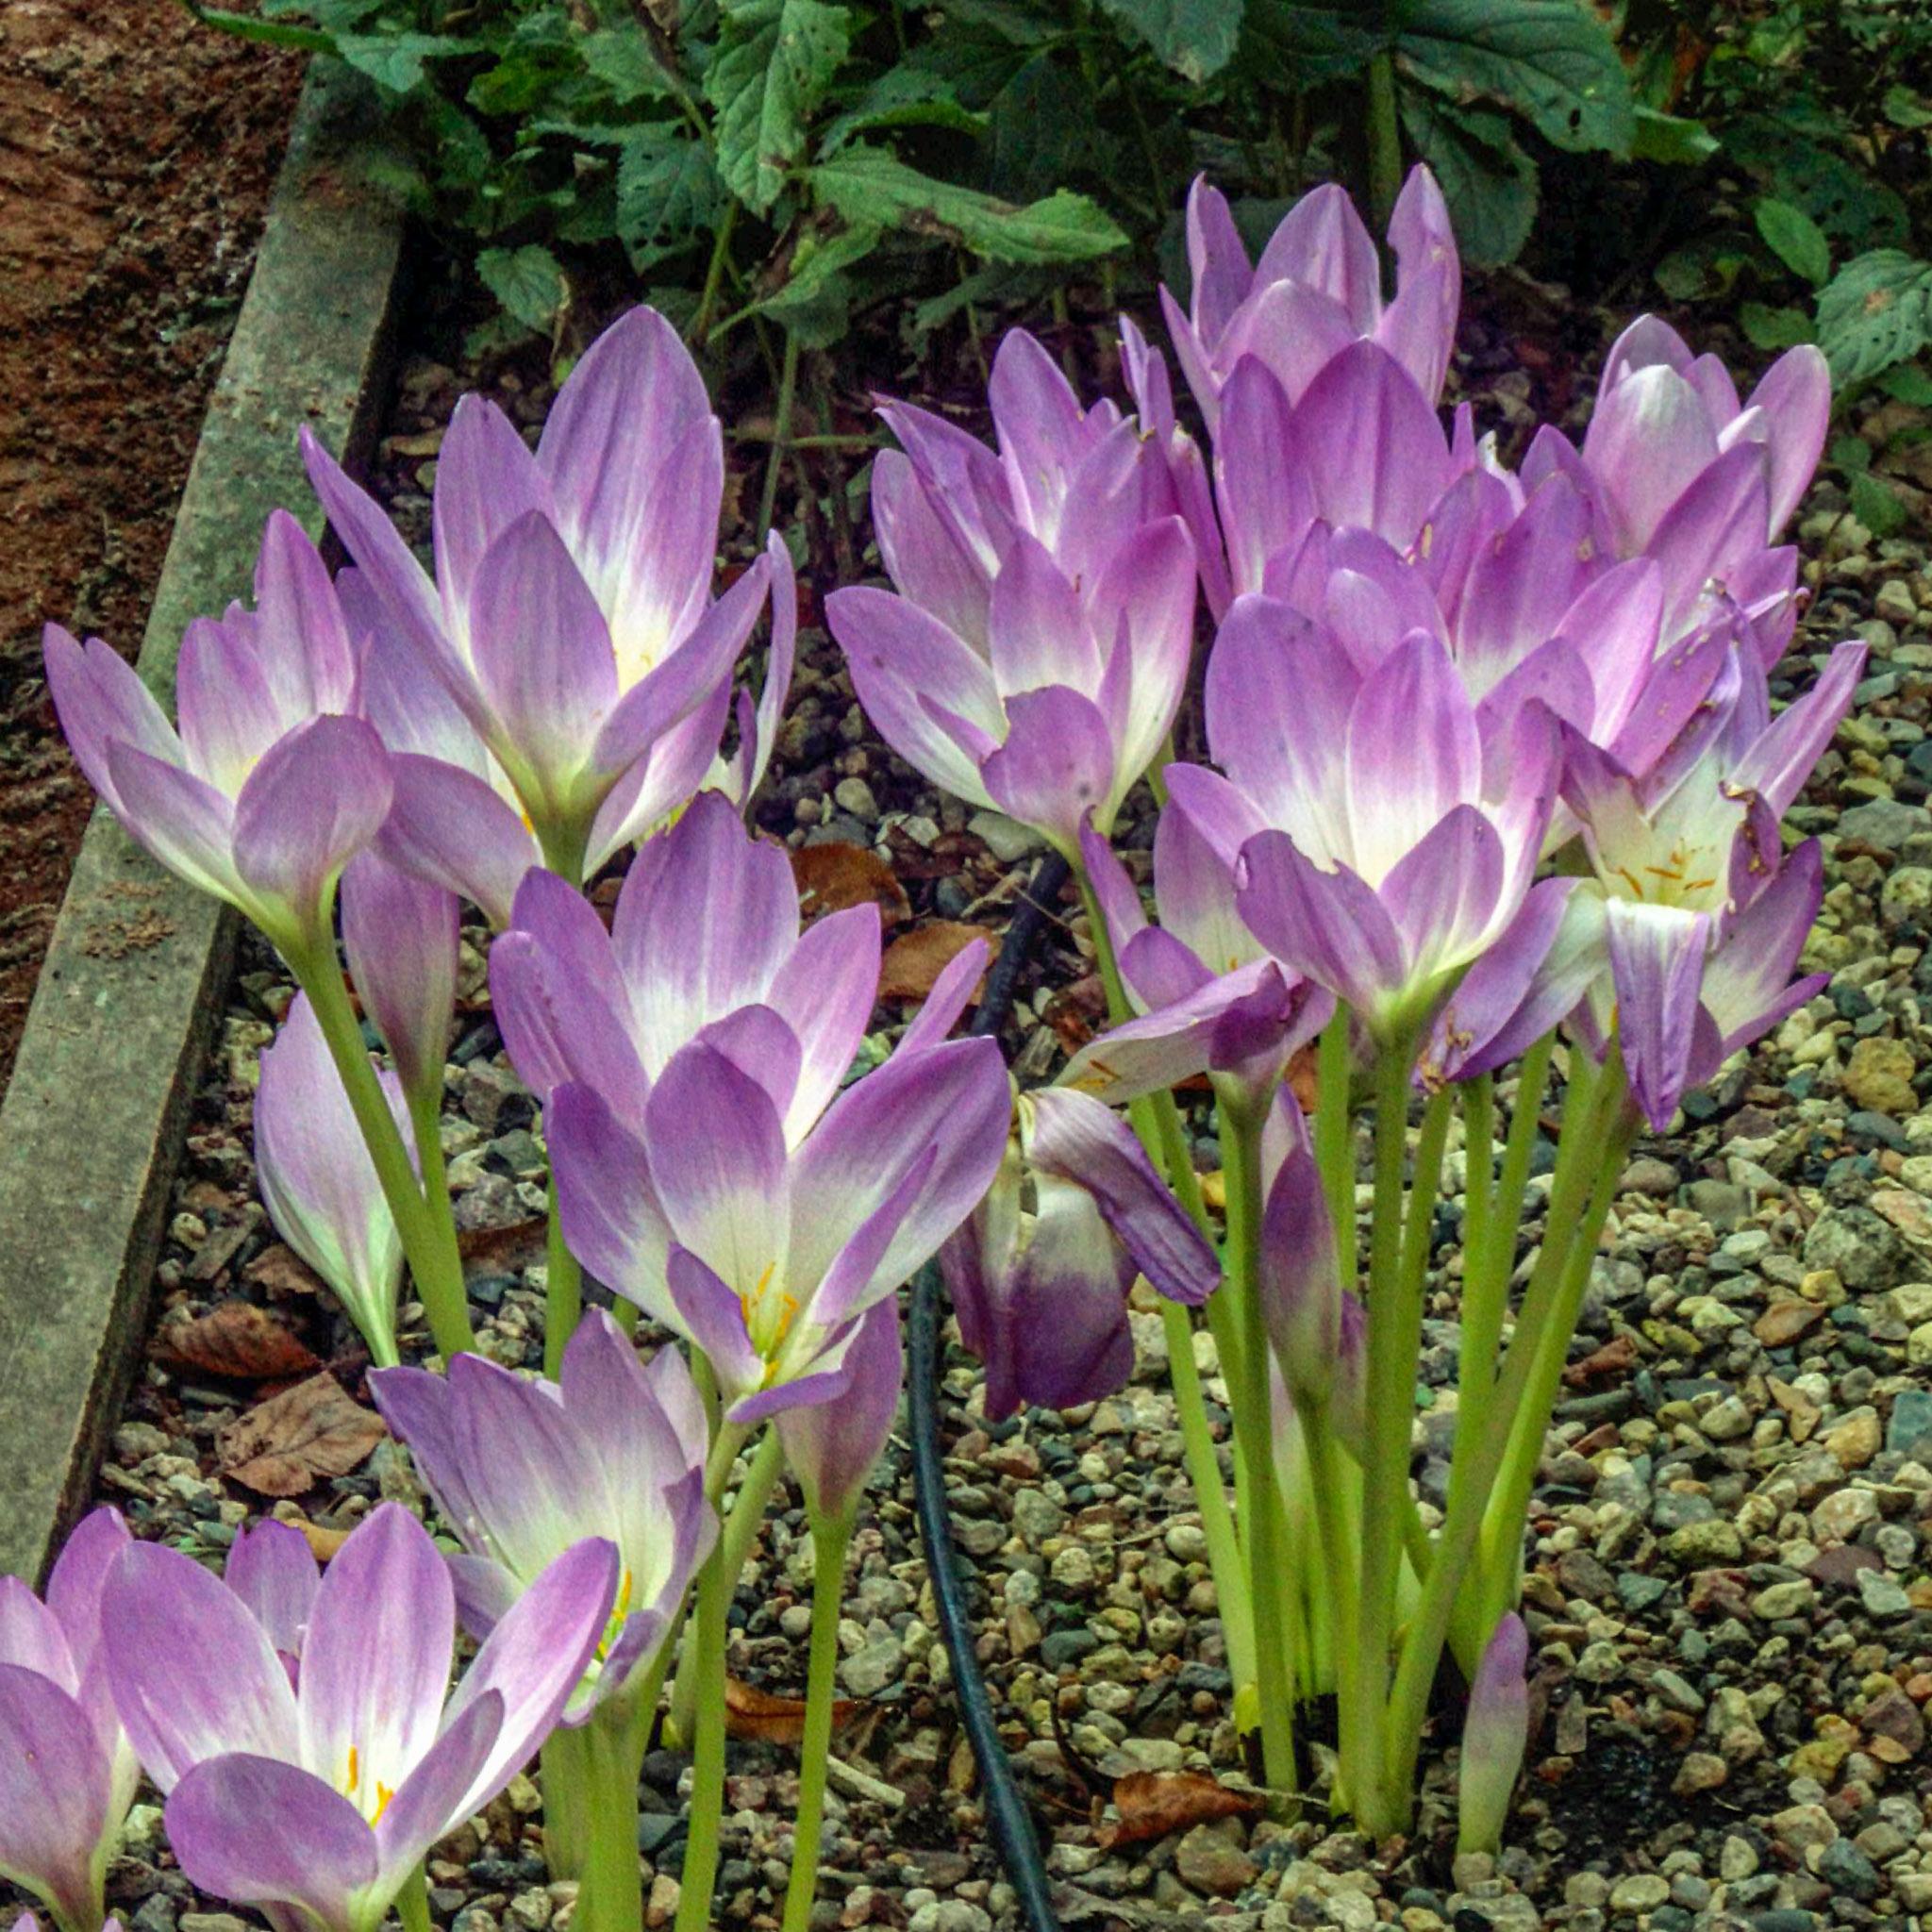 Vėlyviai gėlės